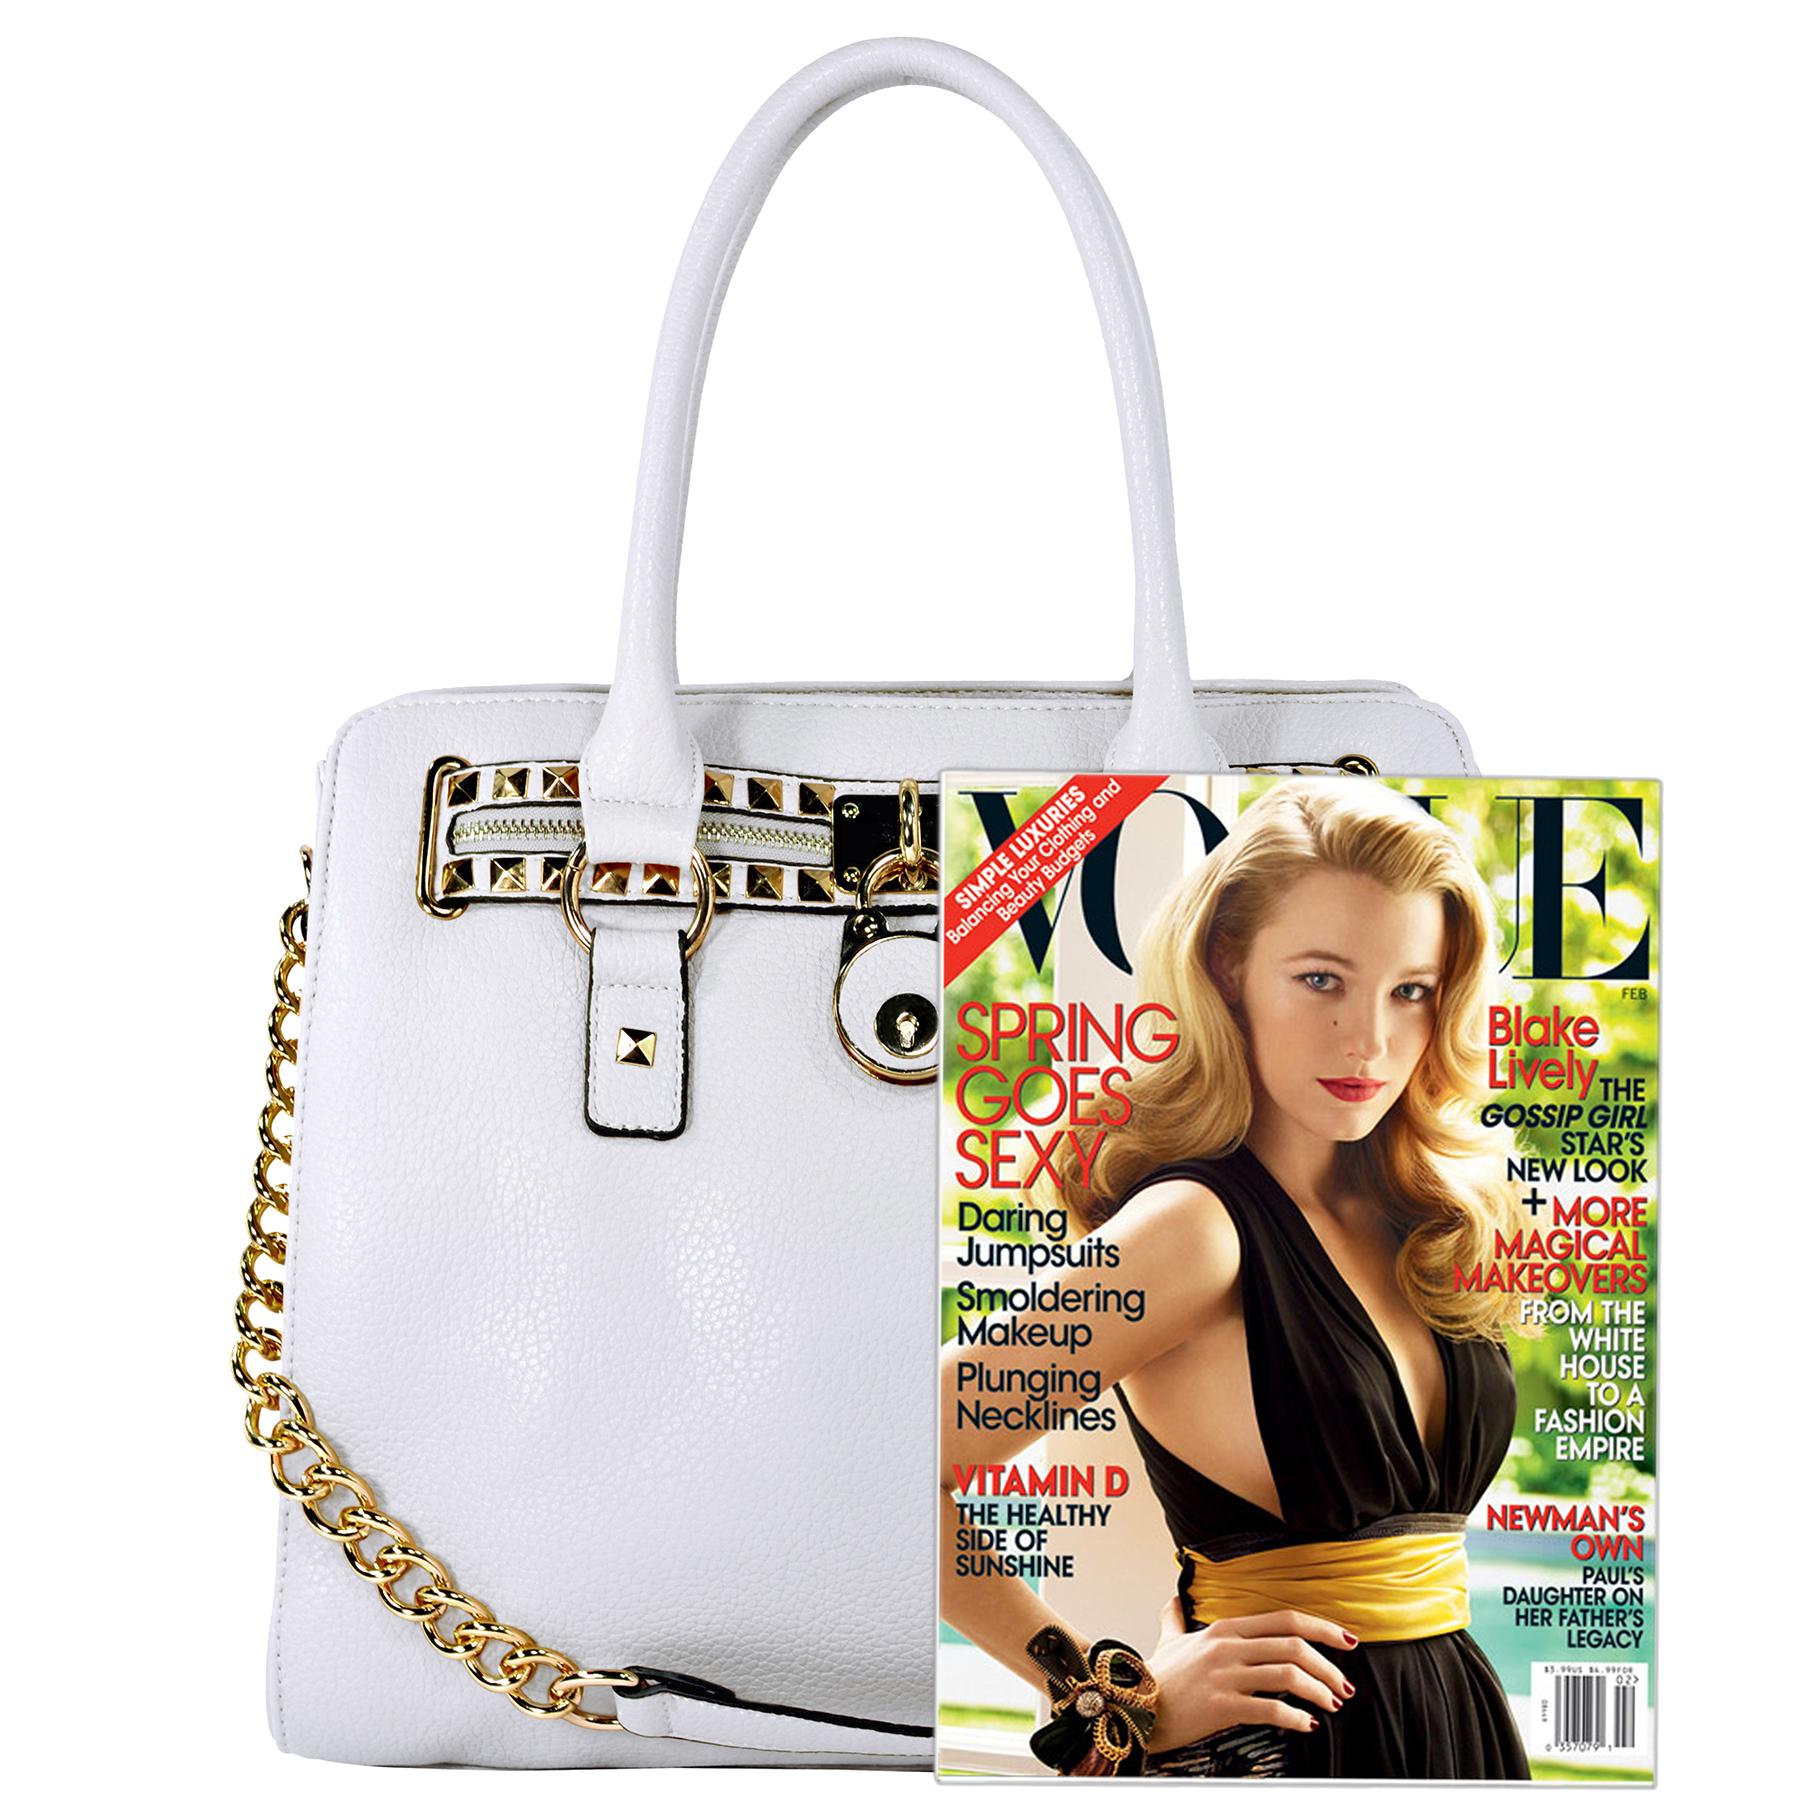 HALEY White Bowler Style Handbag Size